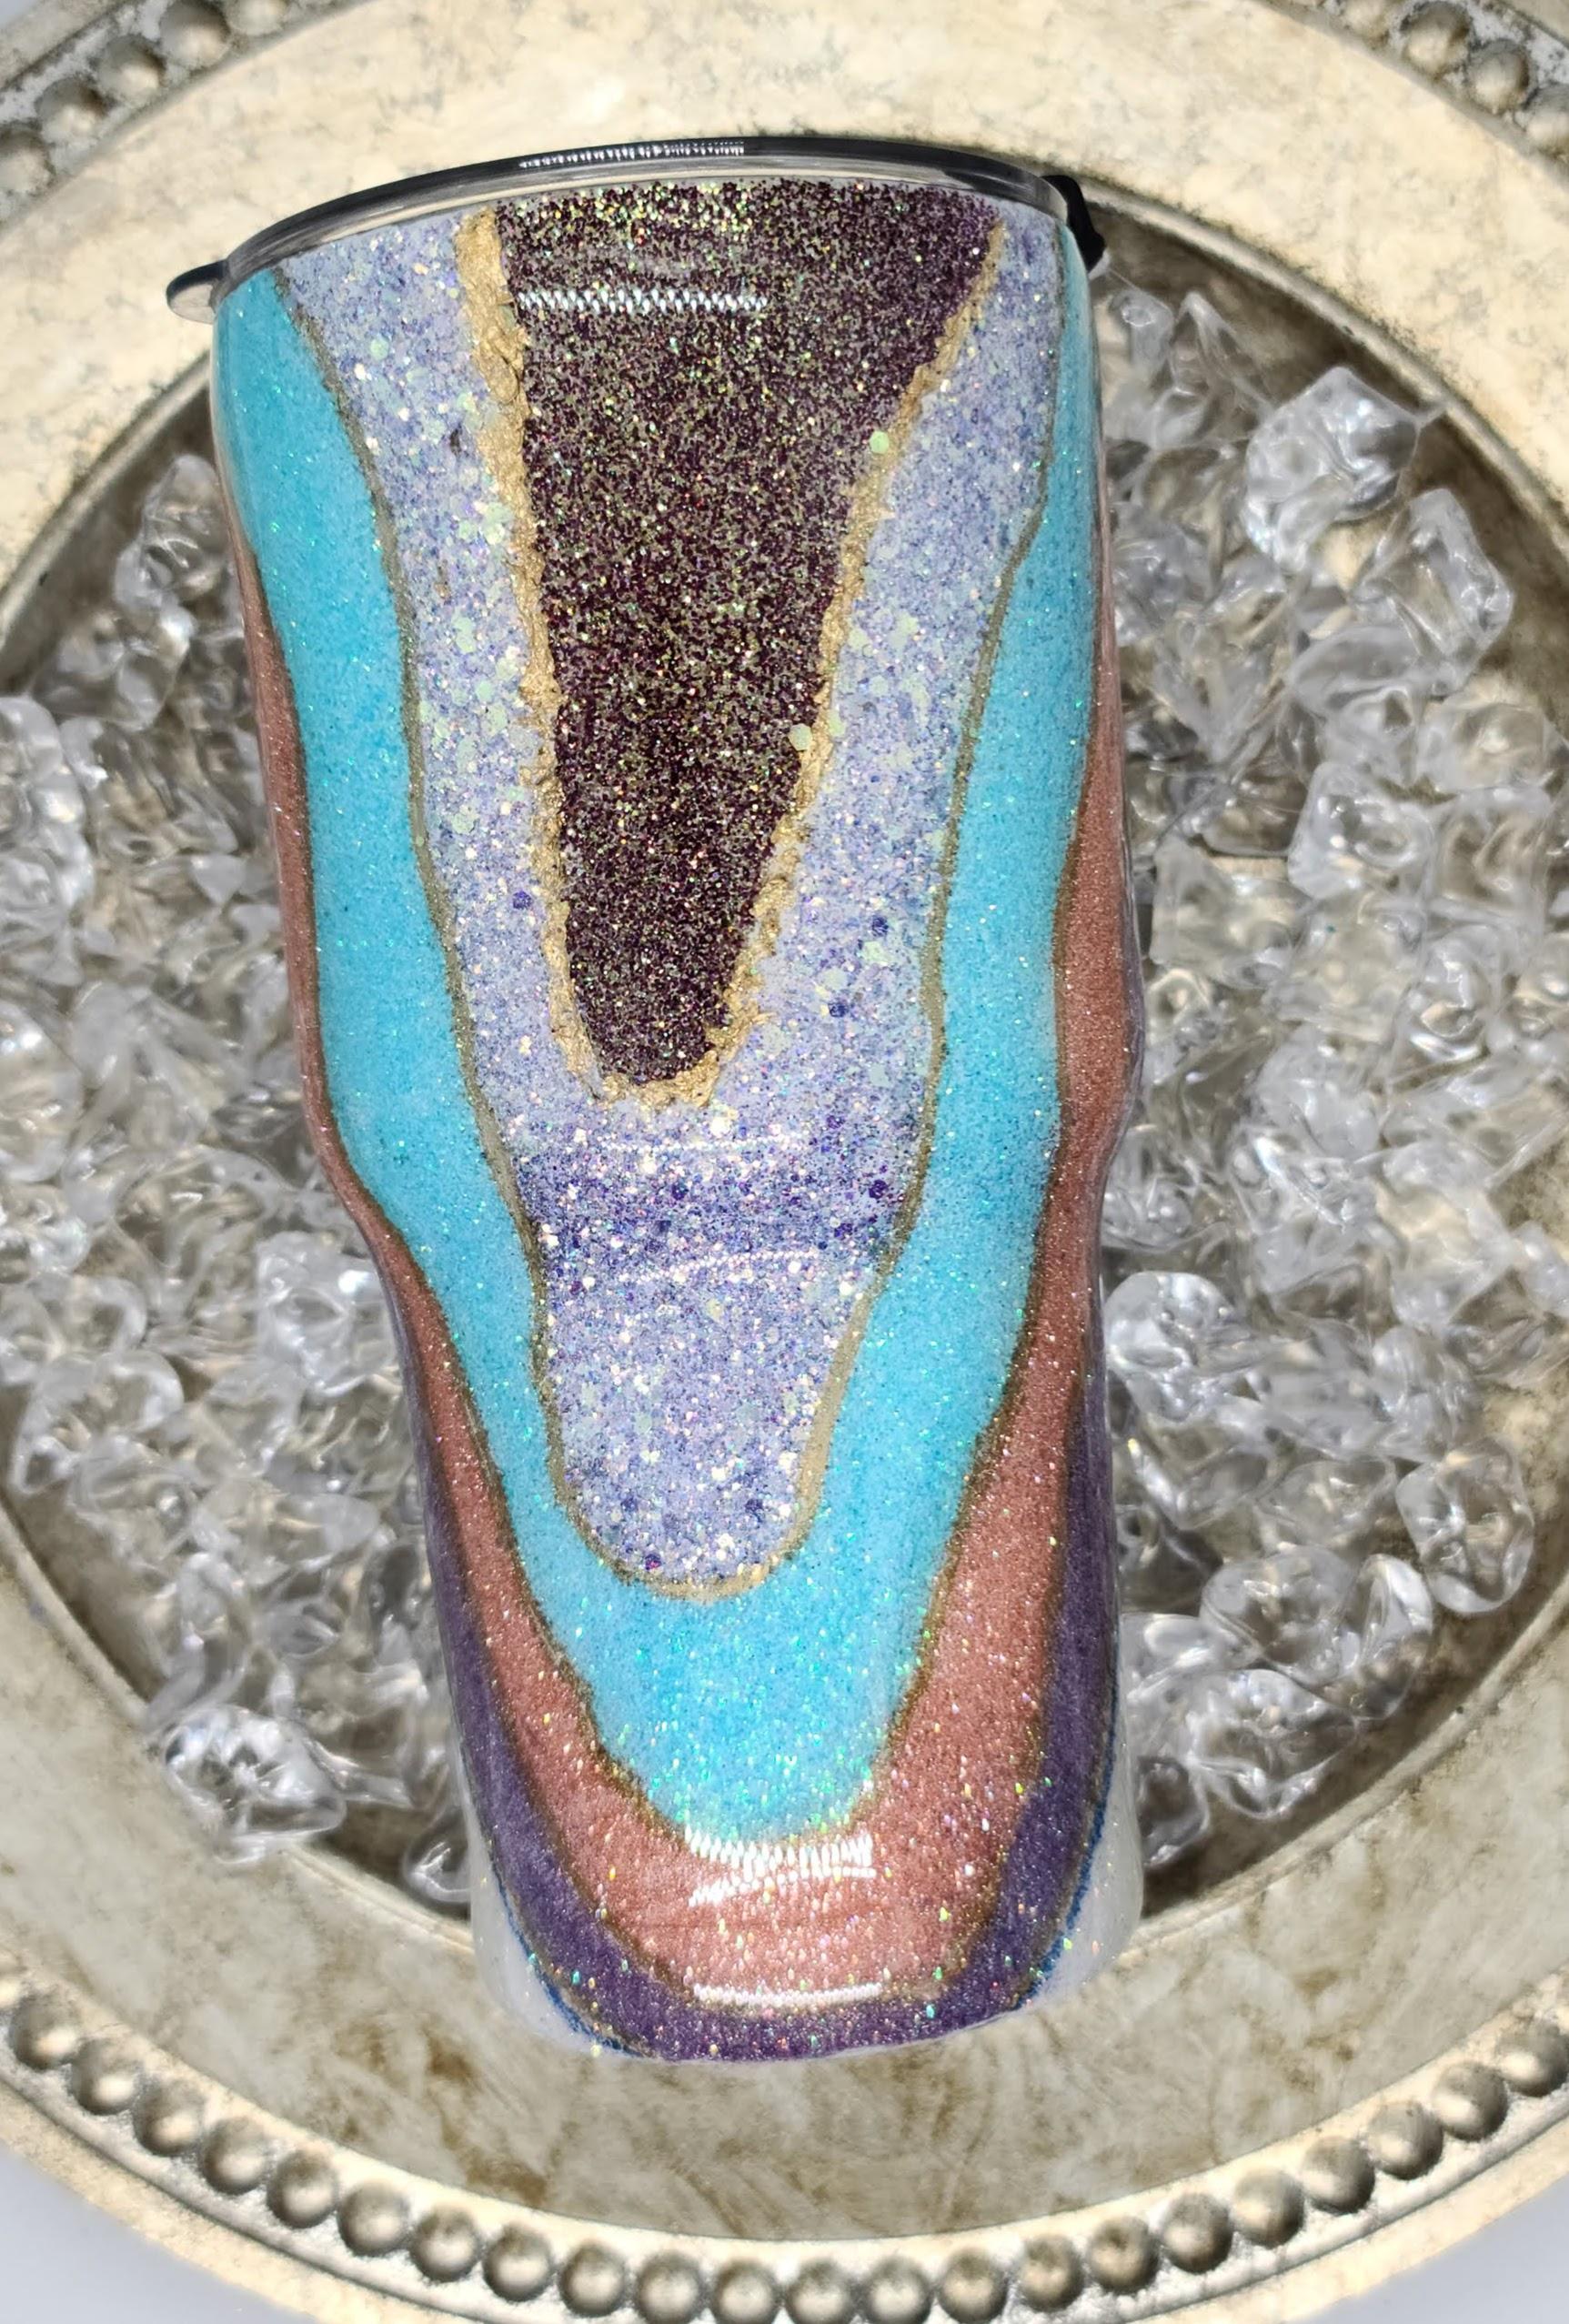 30oz Reverse Geode